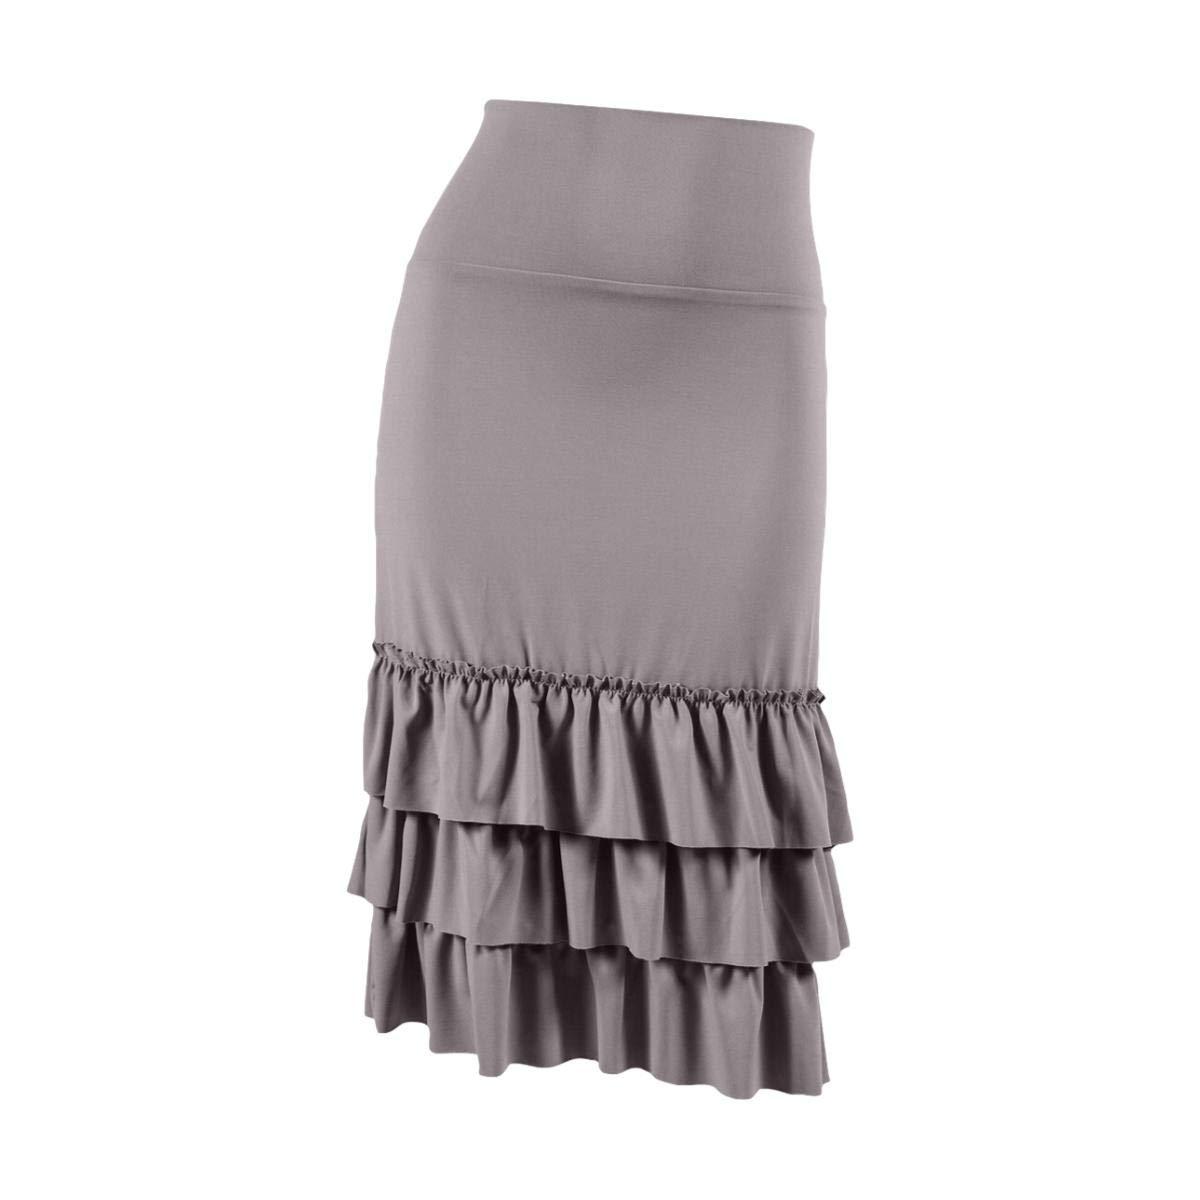 Peekaboo-Chic Bring on The Frill Half Slip Skirt Extender | Plus Size (Gray, 2X)